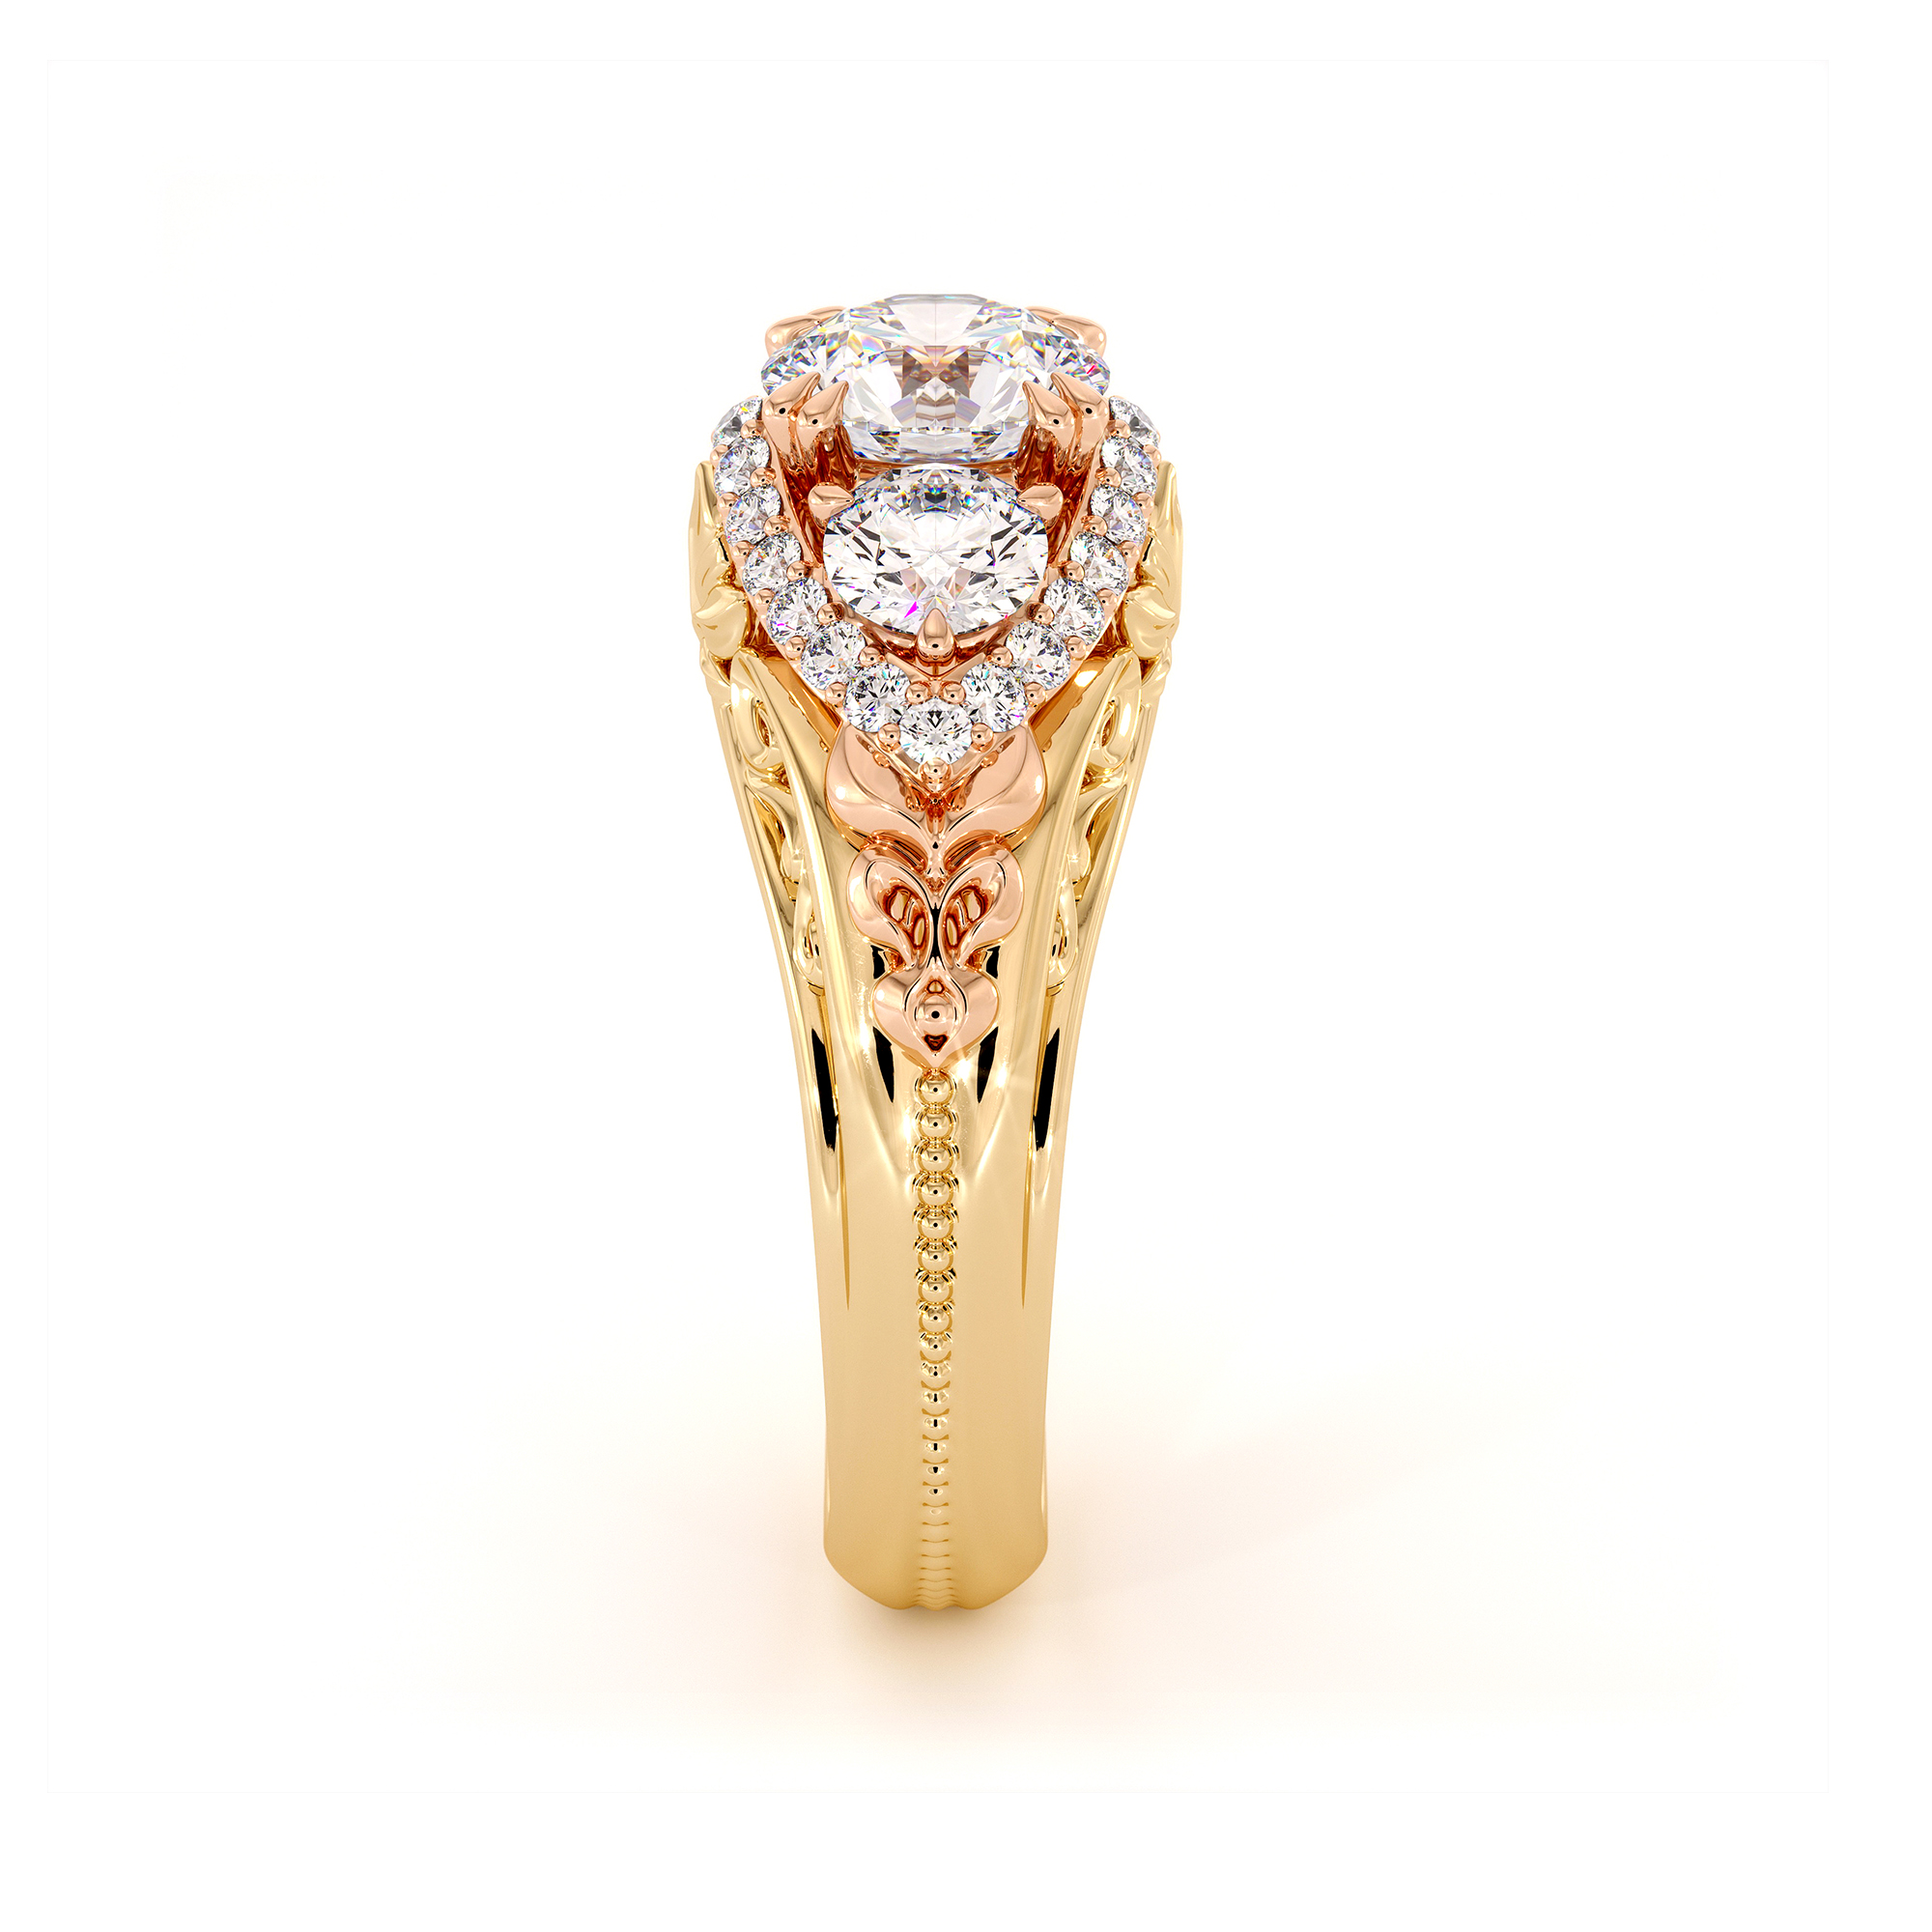 3 Stone Moissanite Diamonds 2 Tone Gold Regal Luxury Engagement Ring